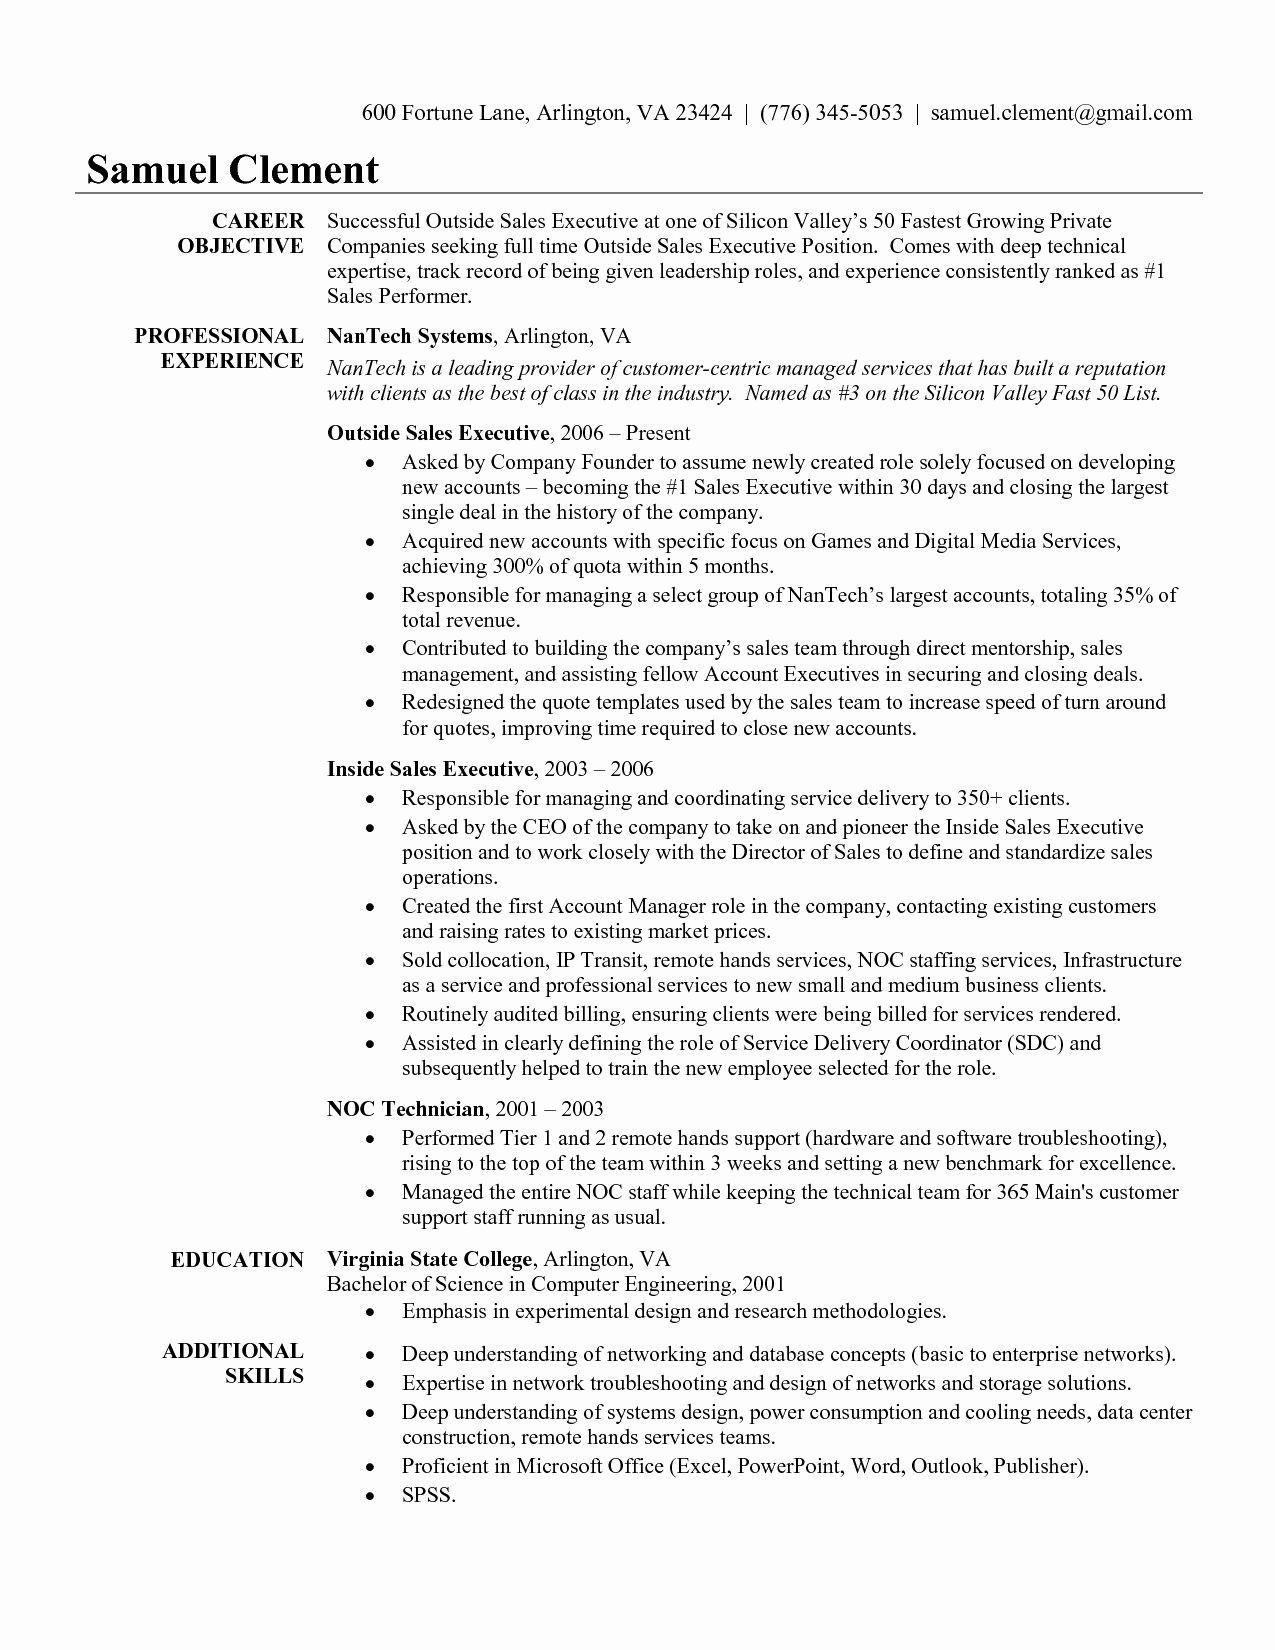 Tier 2 Resume Examples Resume Templates Resume Examples Job Resume Examples Sales Resume Examples